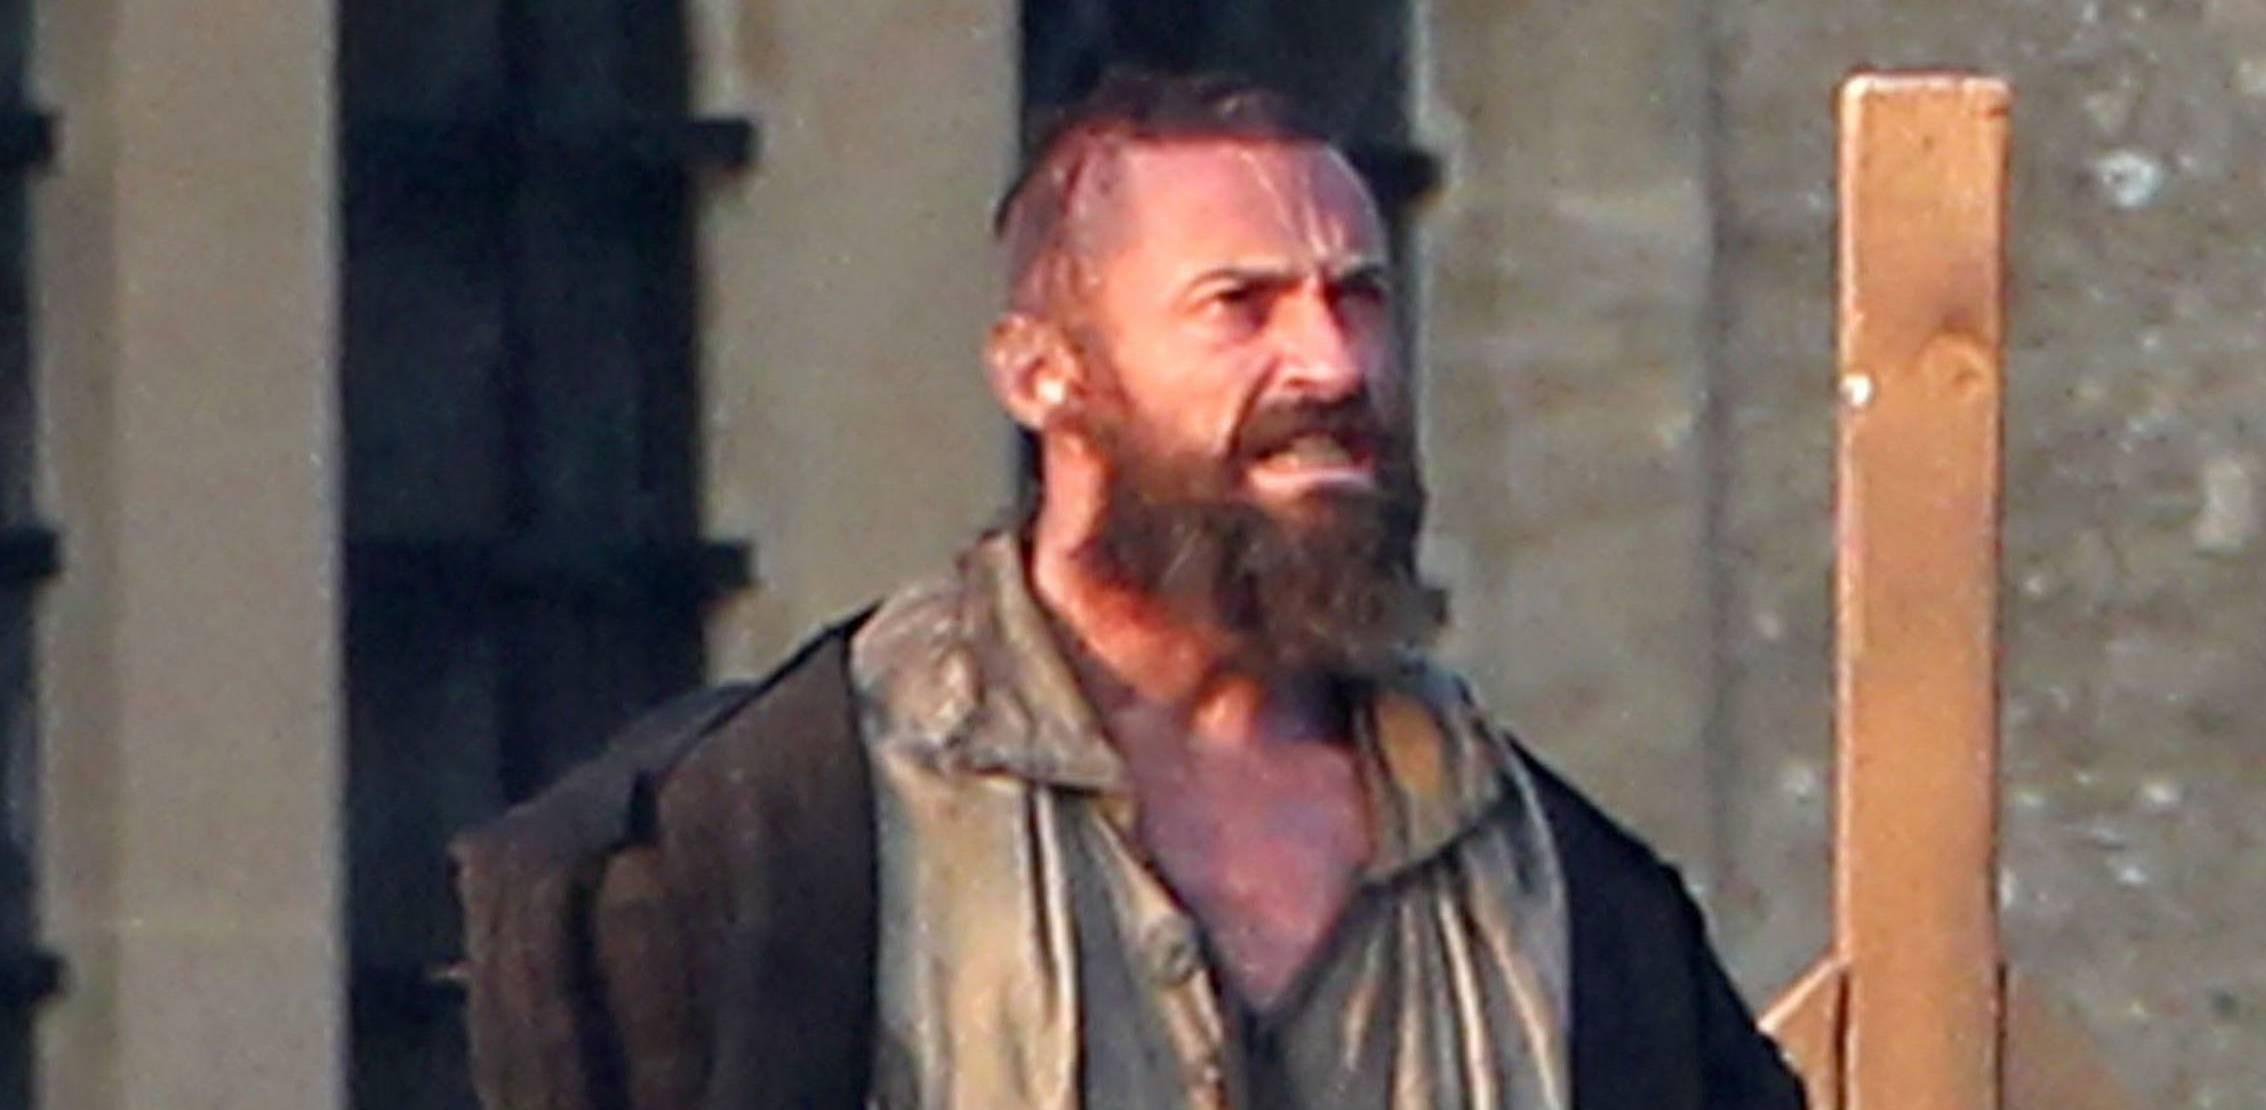 Hugh Jackman Has a Nice Beard Going for 'Les Miserables' | The Blemish  Hugh Jackman Ha...